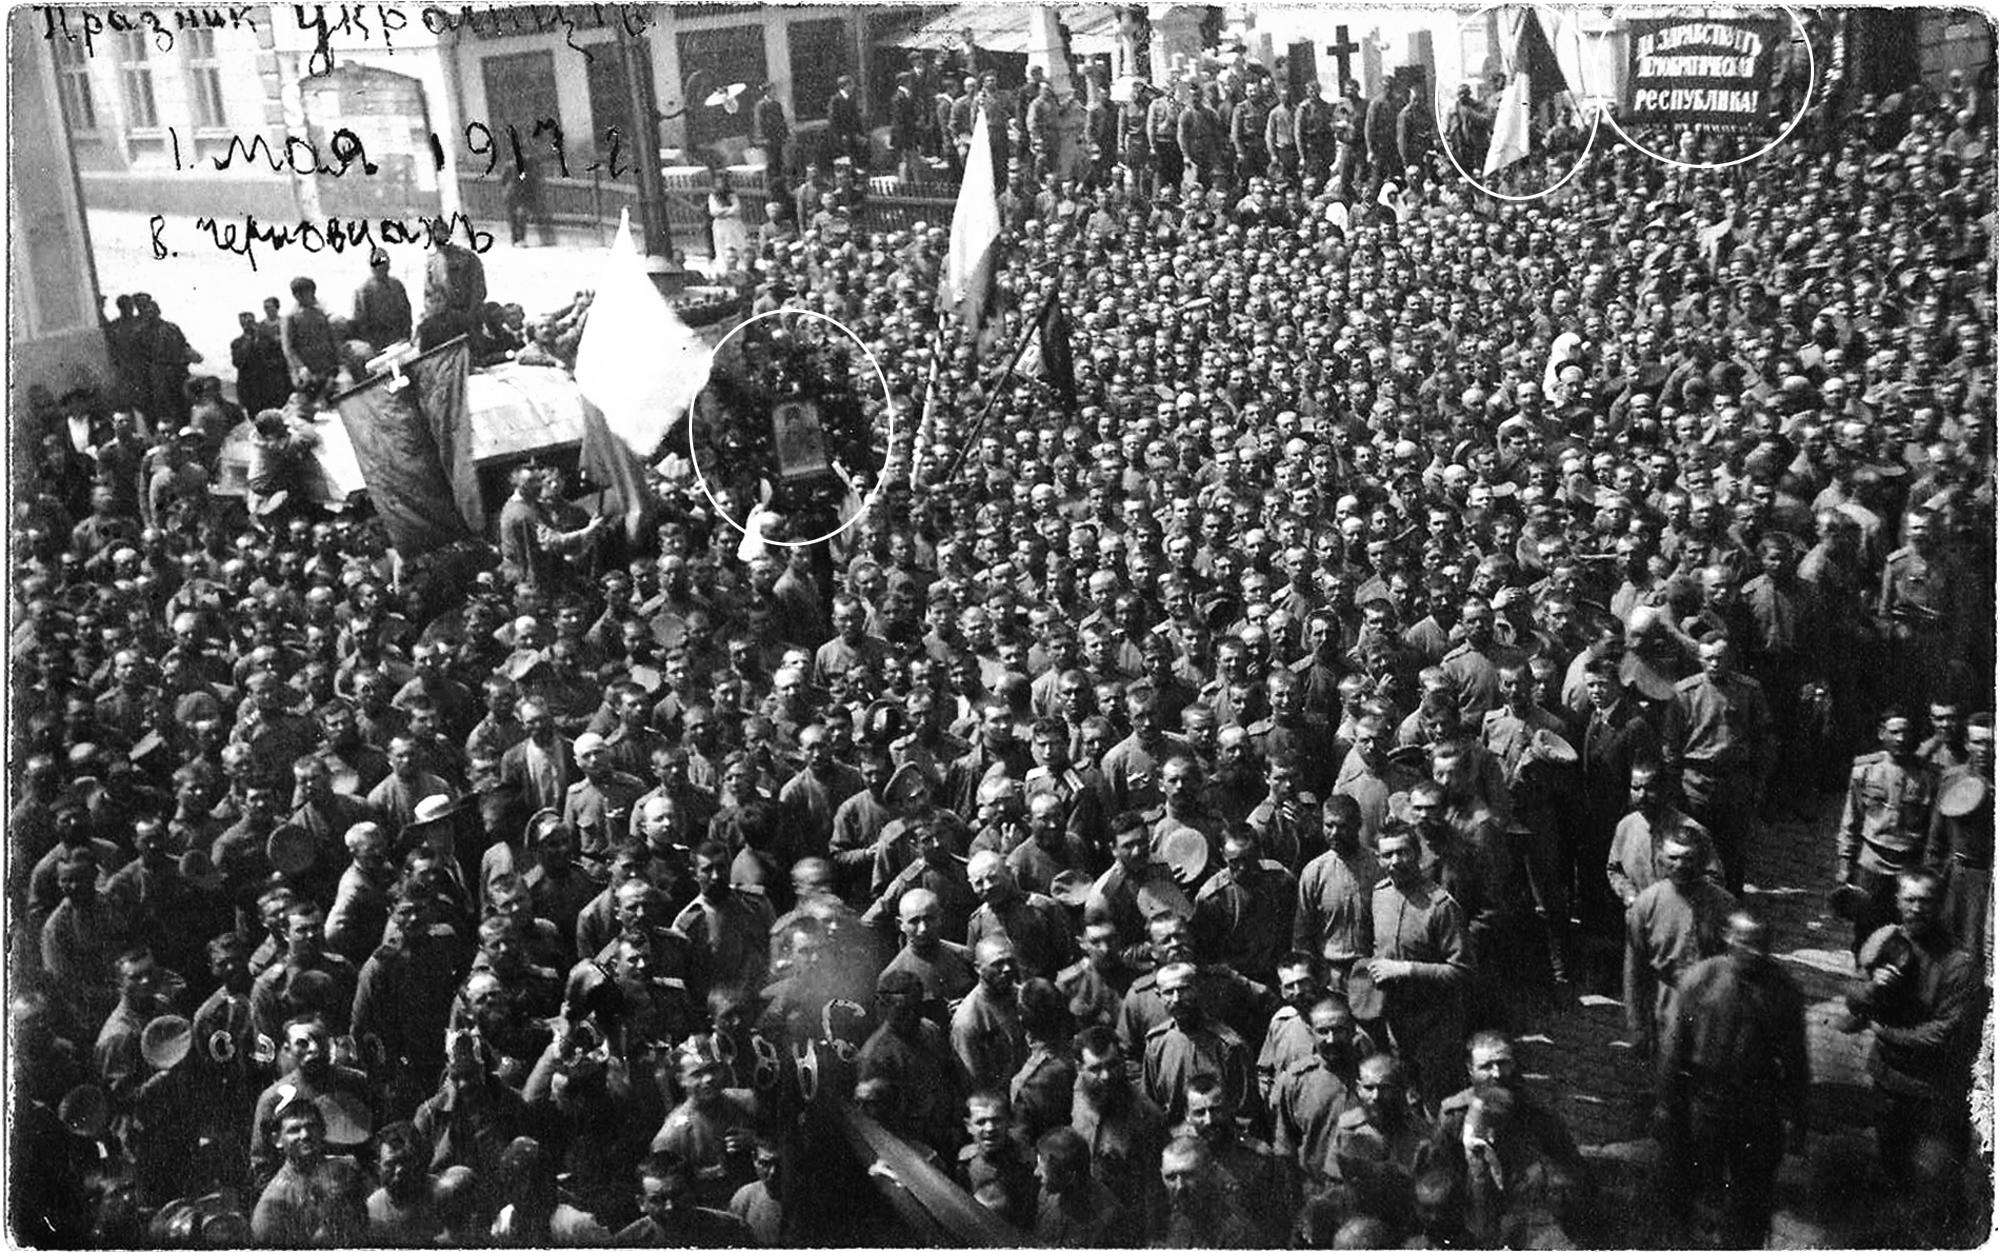 Українська демонстрація 1 травня 1917